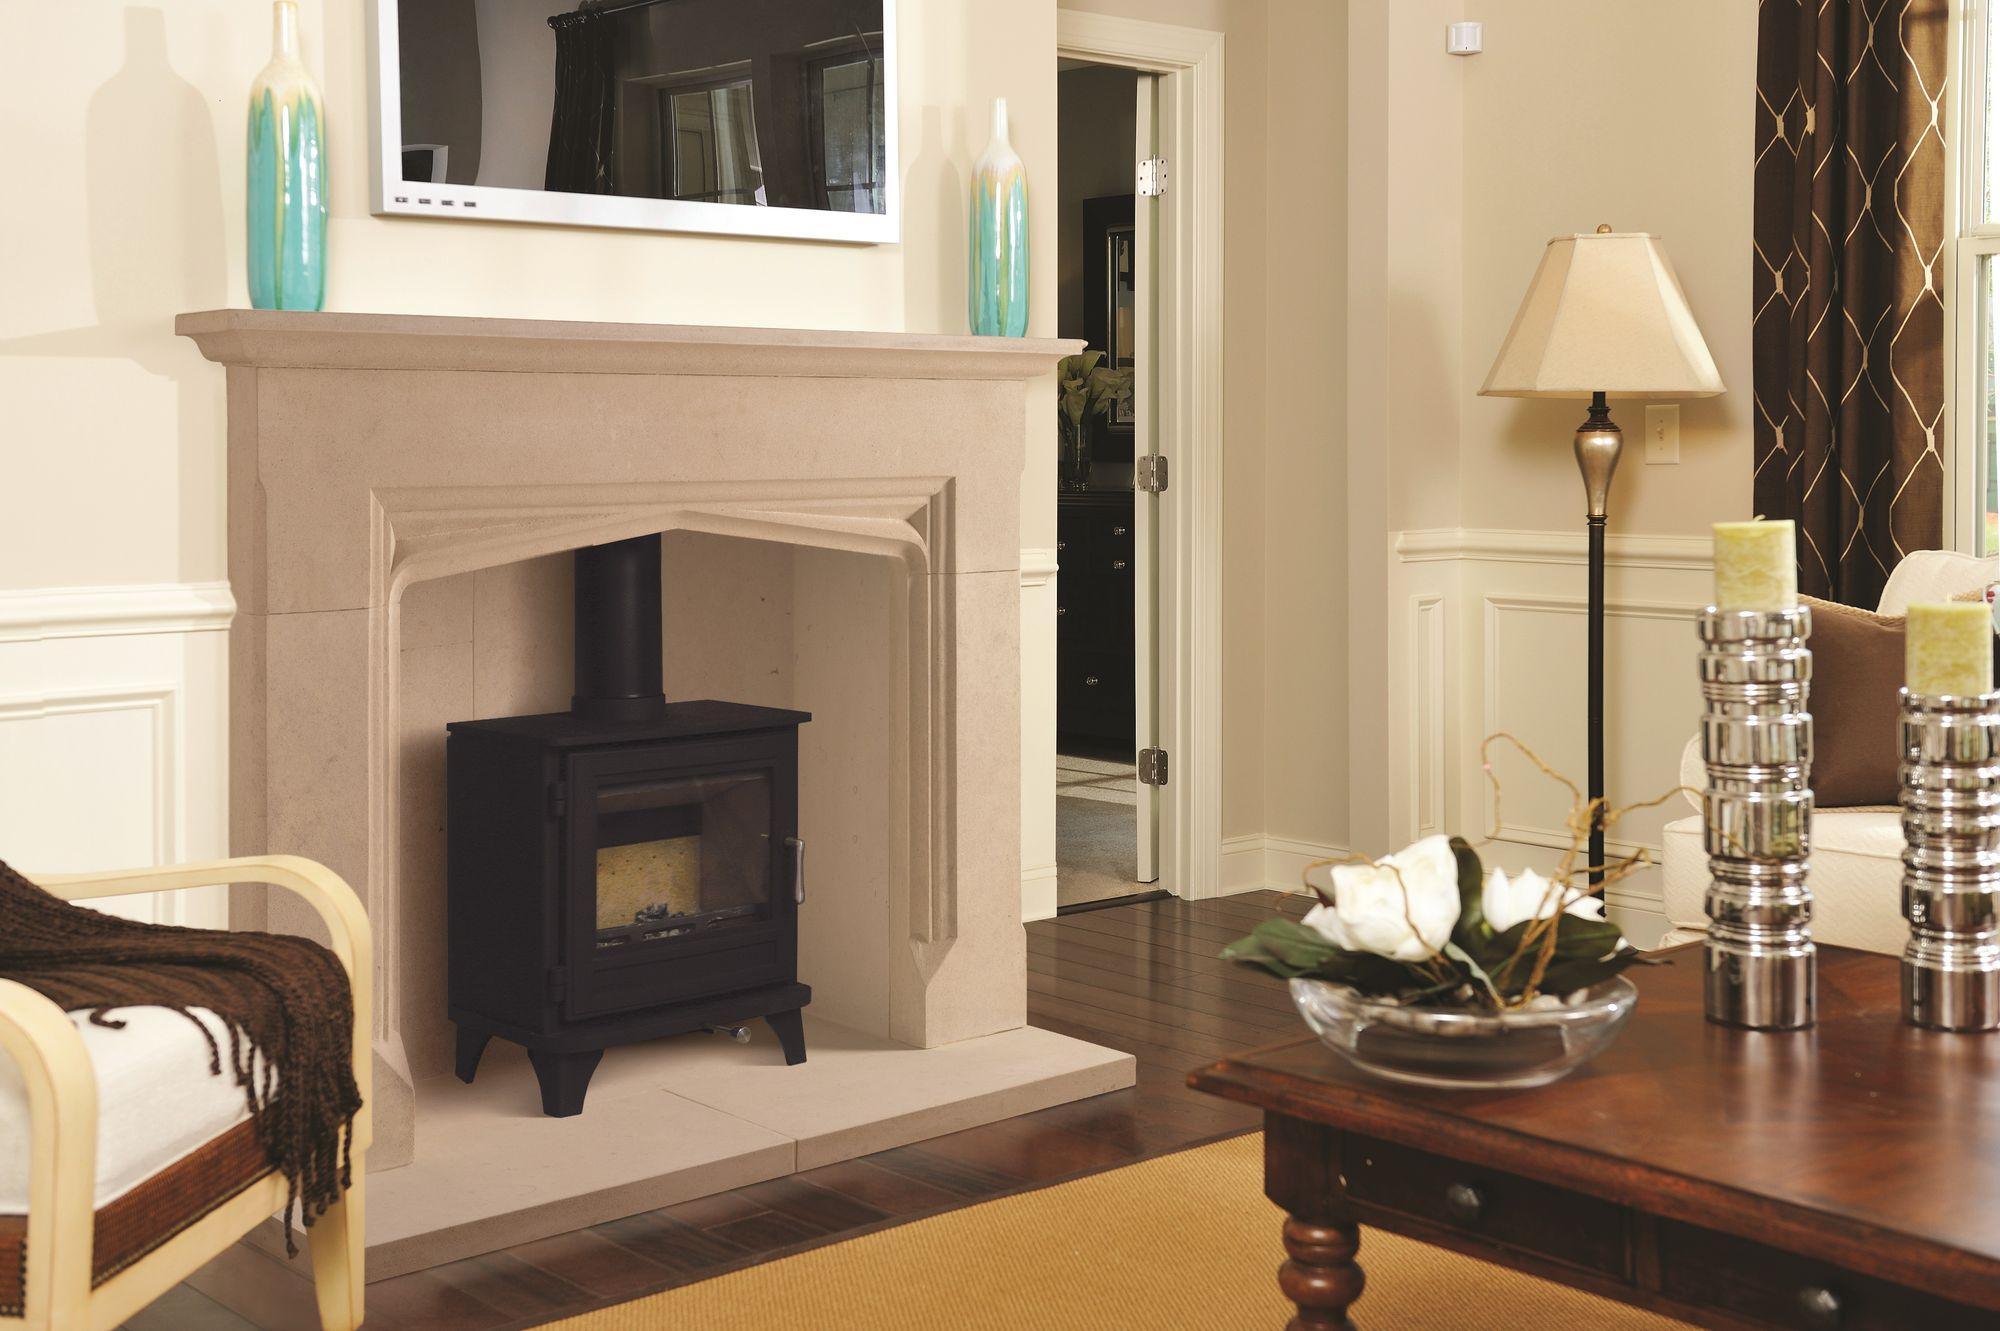 The Hardwick Bathstone Fireplace